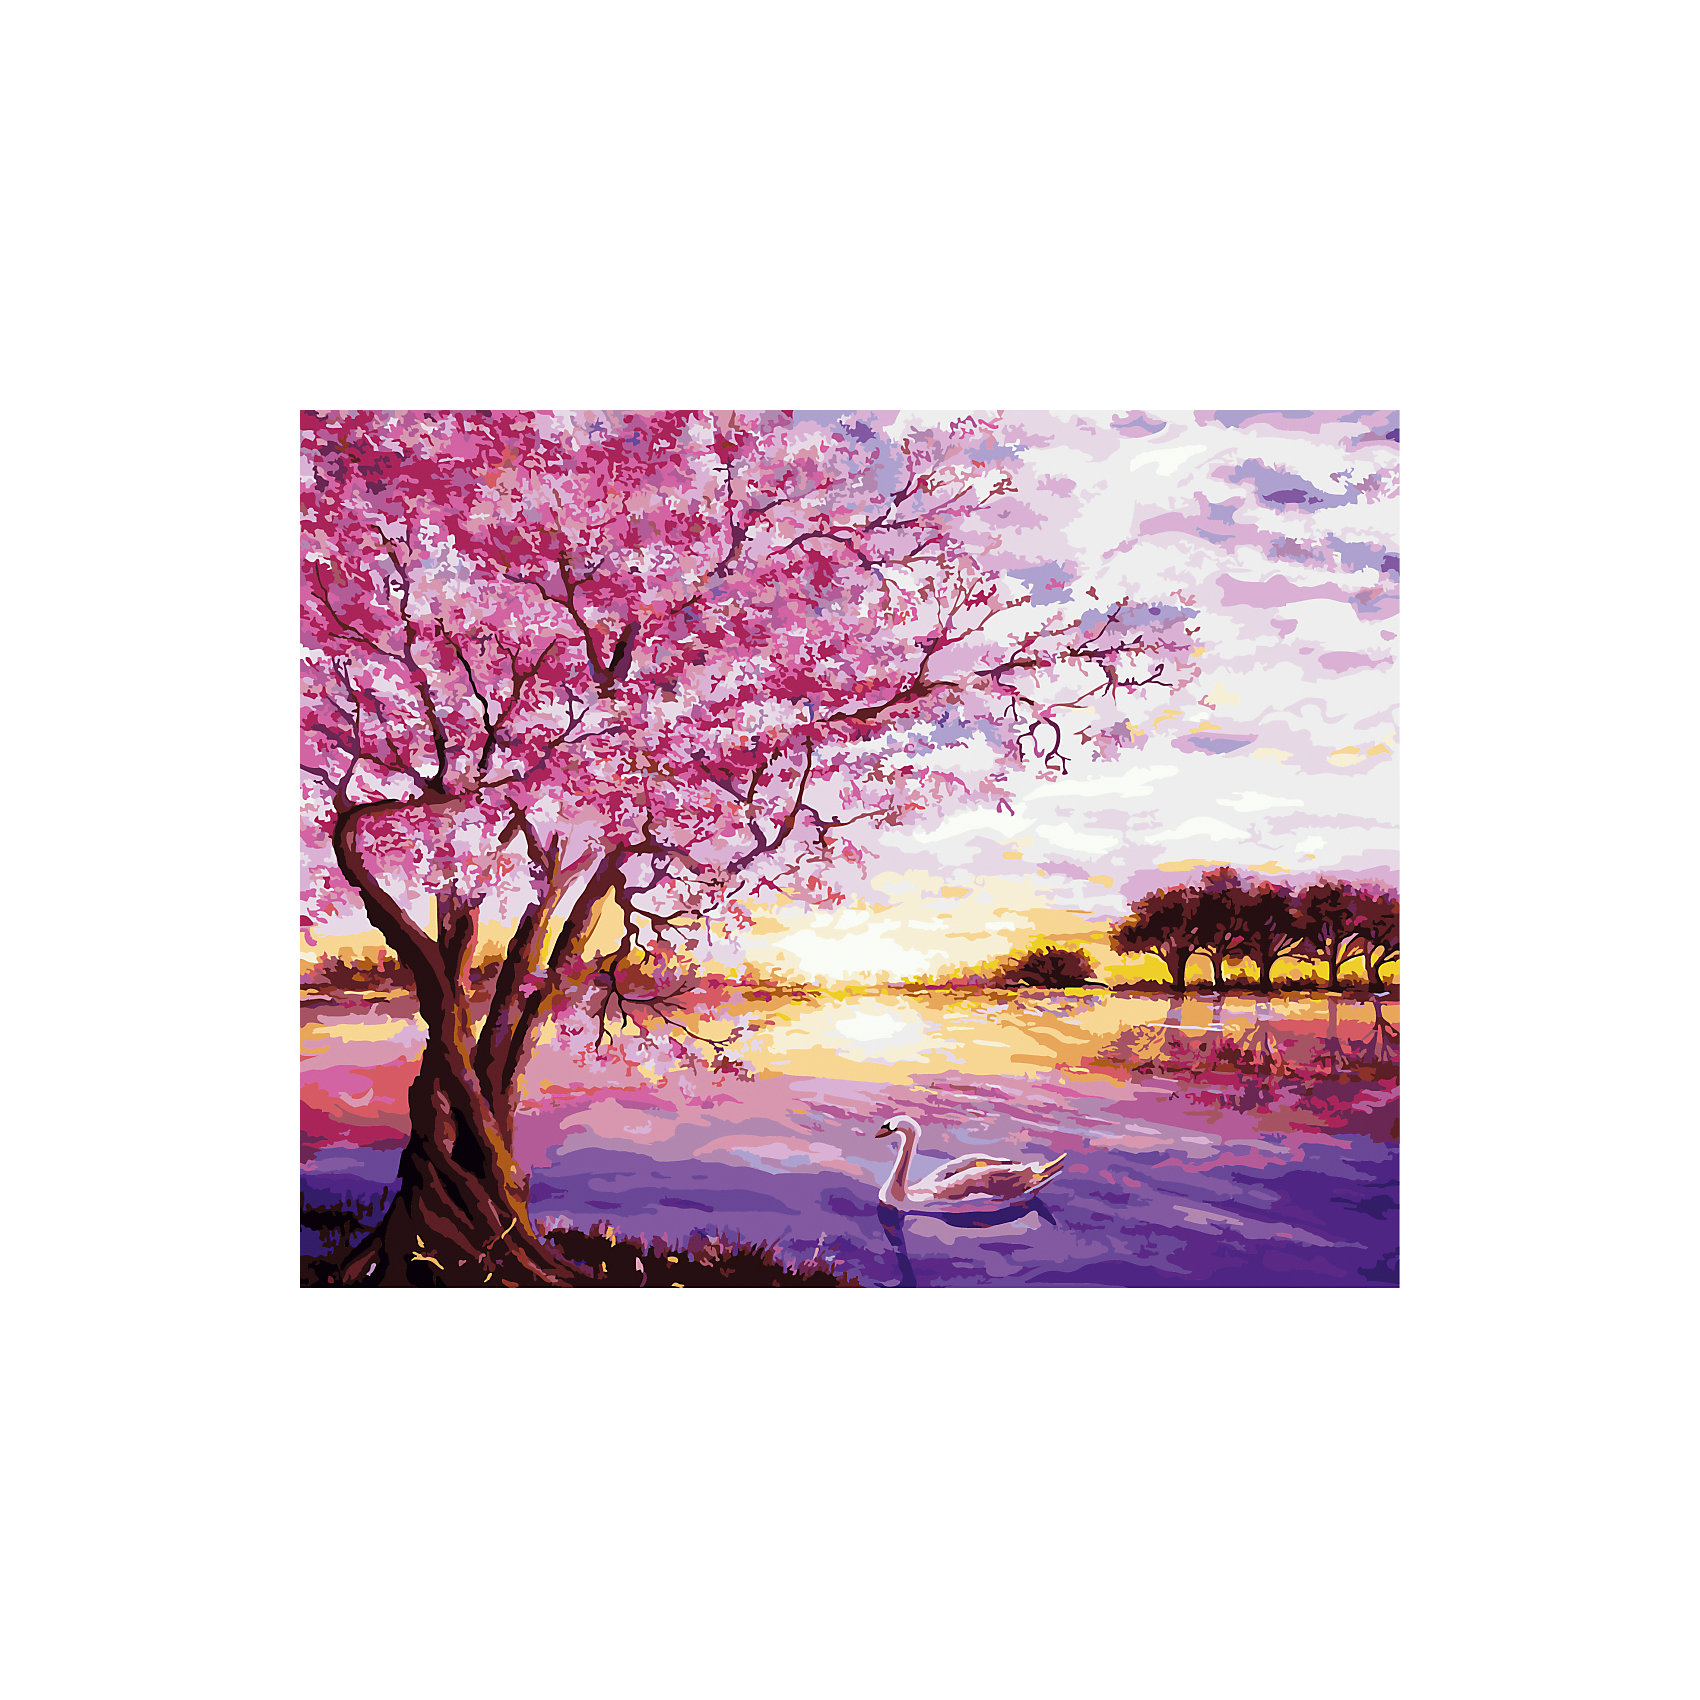 TUKZAR Роспись по номерам Рассвет на озере 40*50 см tukzar роспись по номерам тигры 40 50 см